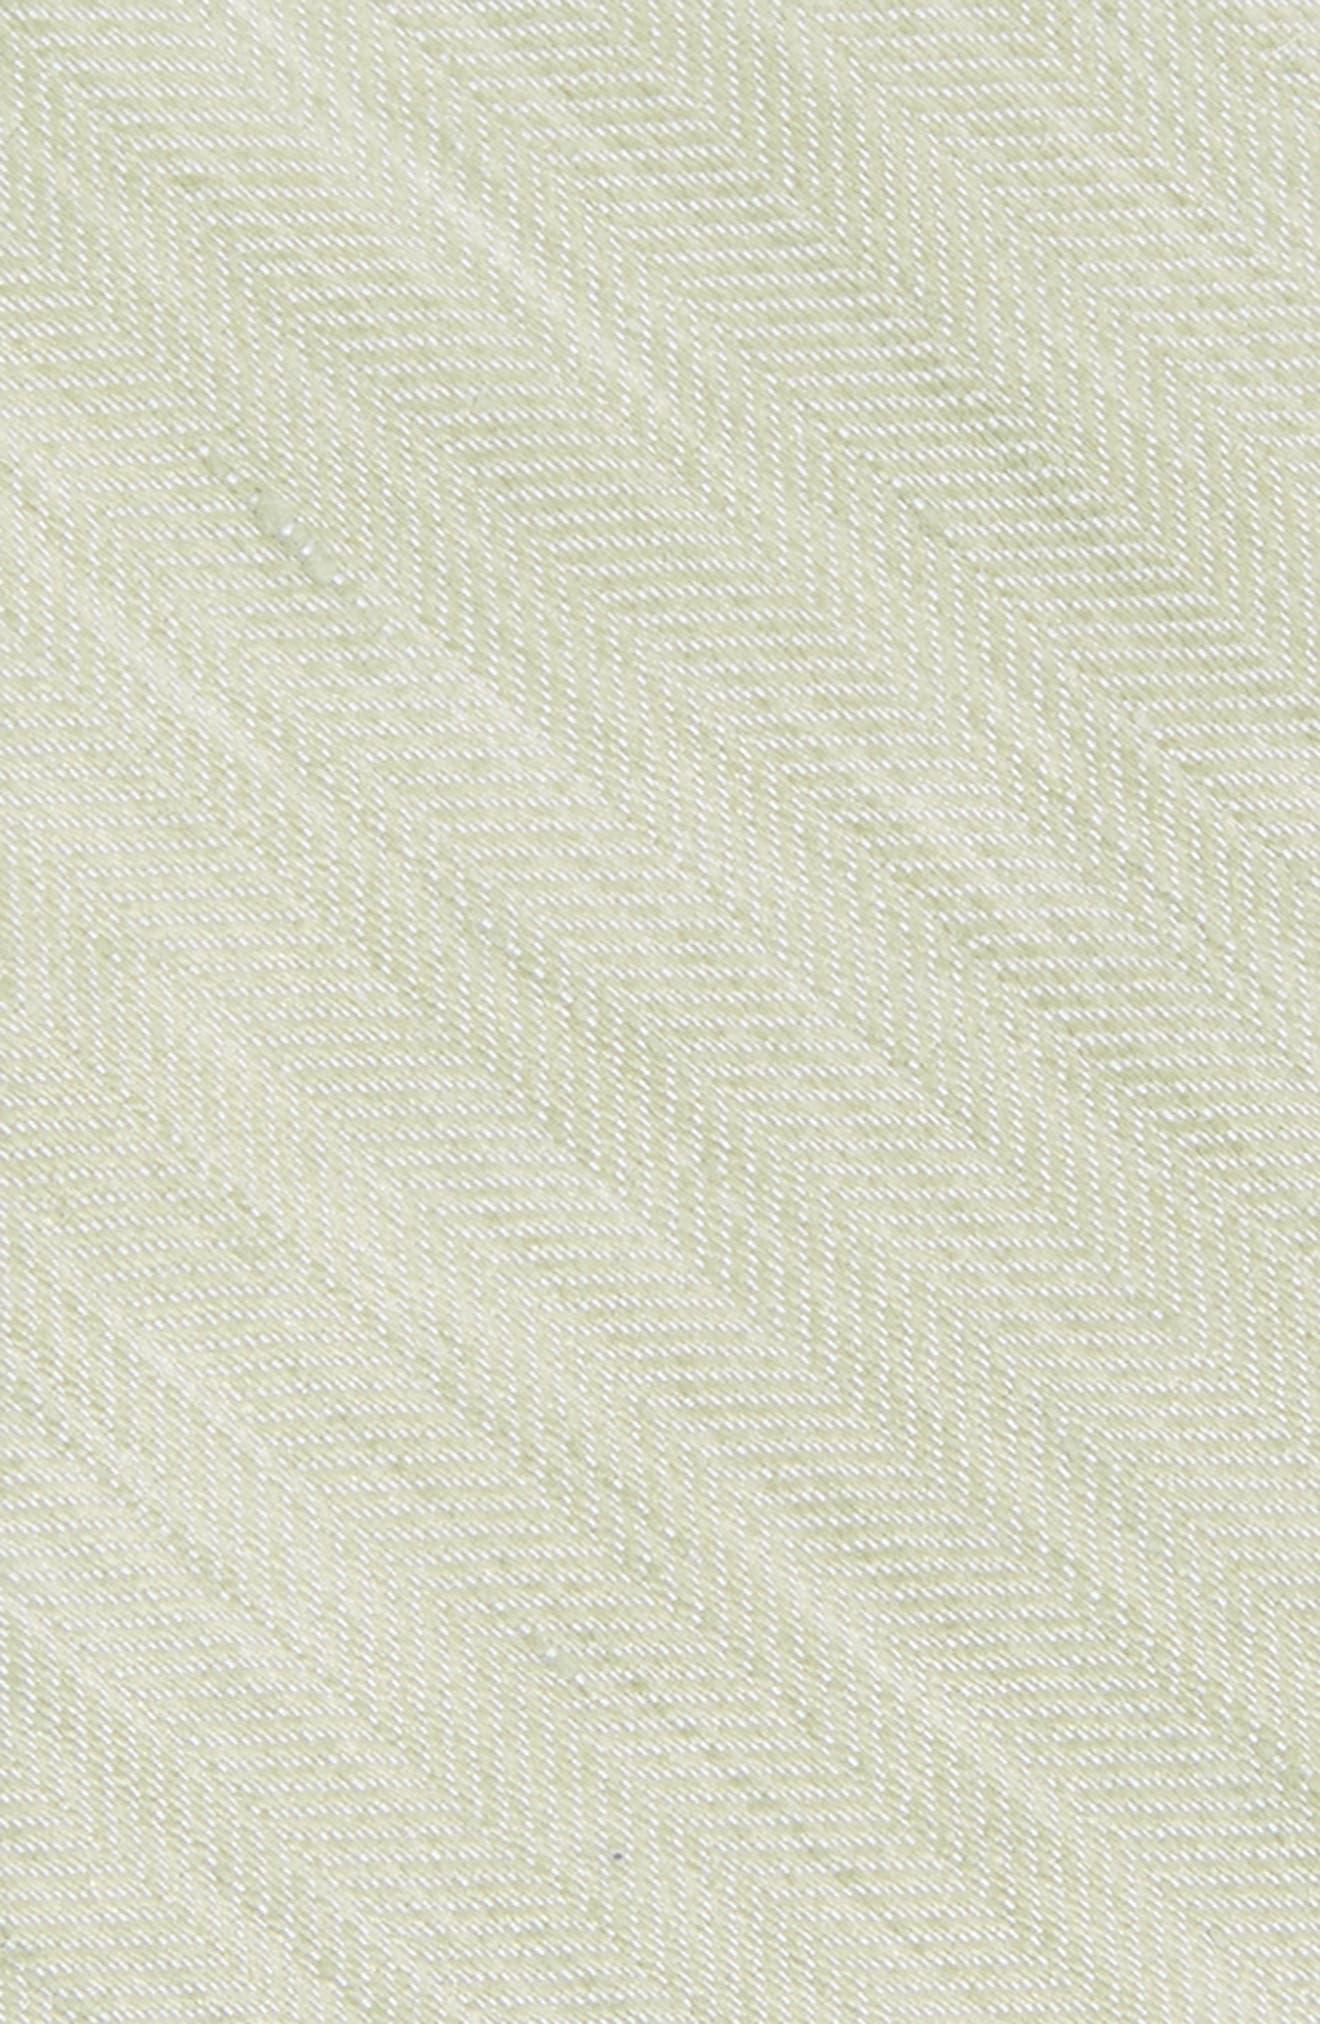 Alternate Image 2  - The Tie Bar Solid Linen & Silk Tie